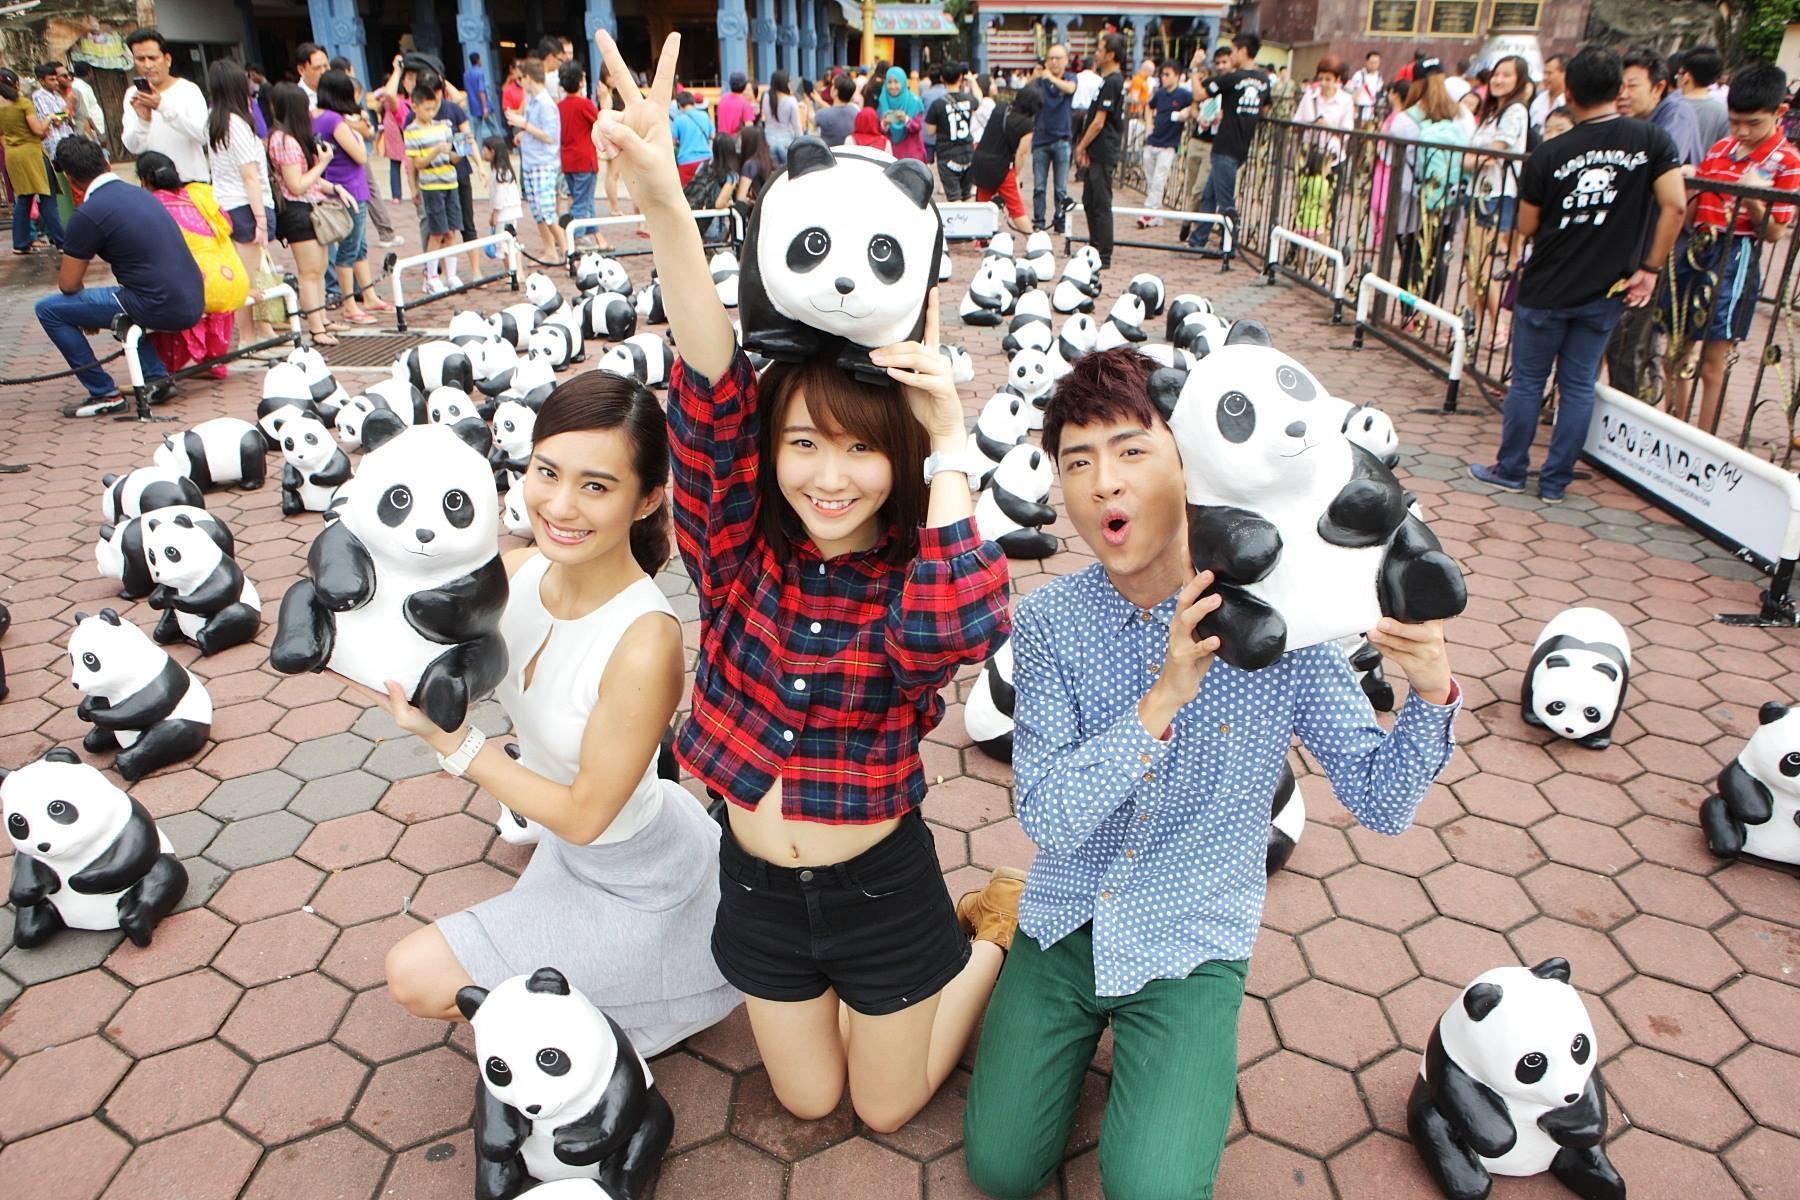 1600-Pandas-Malaisie-8